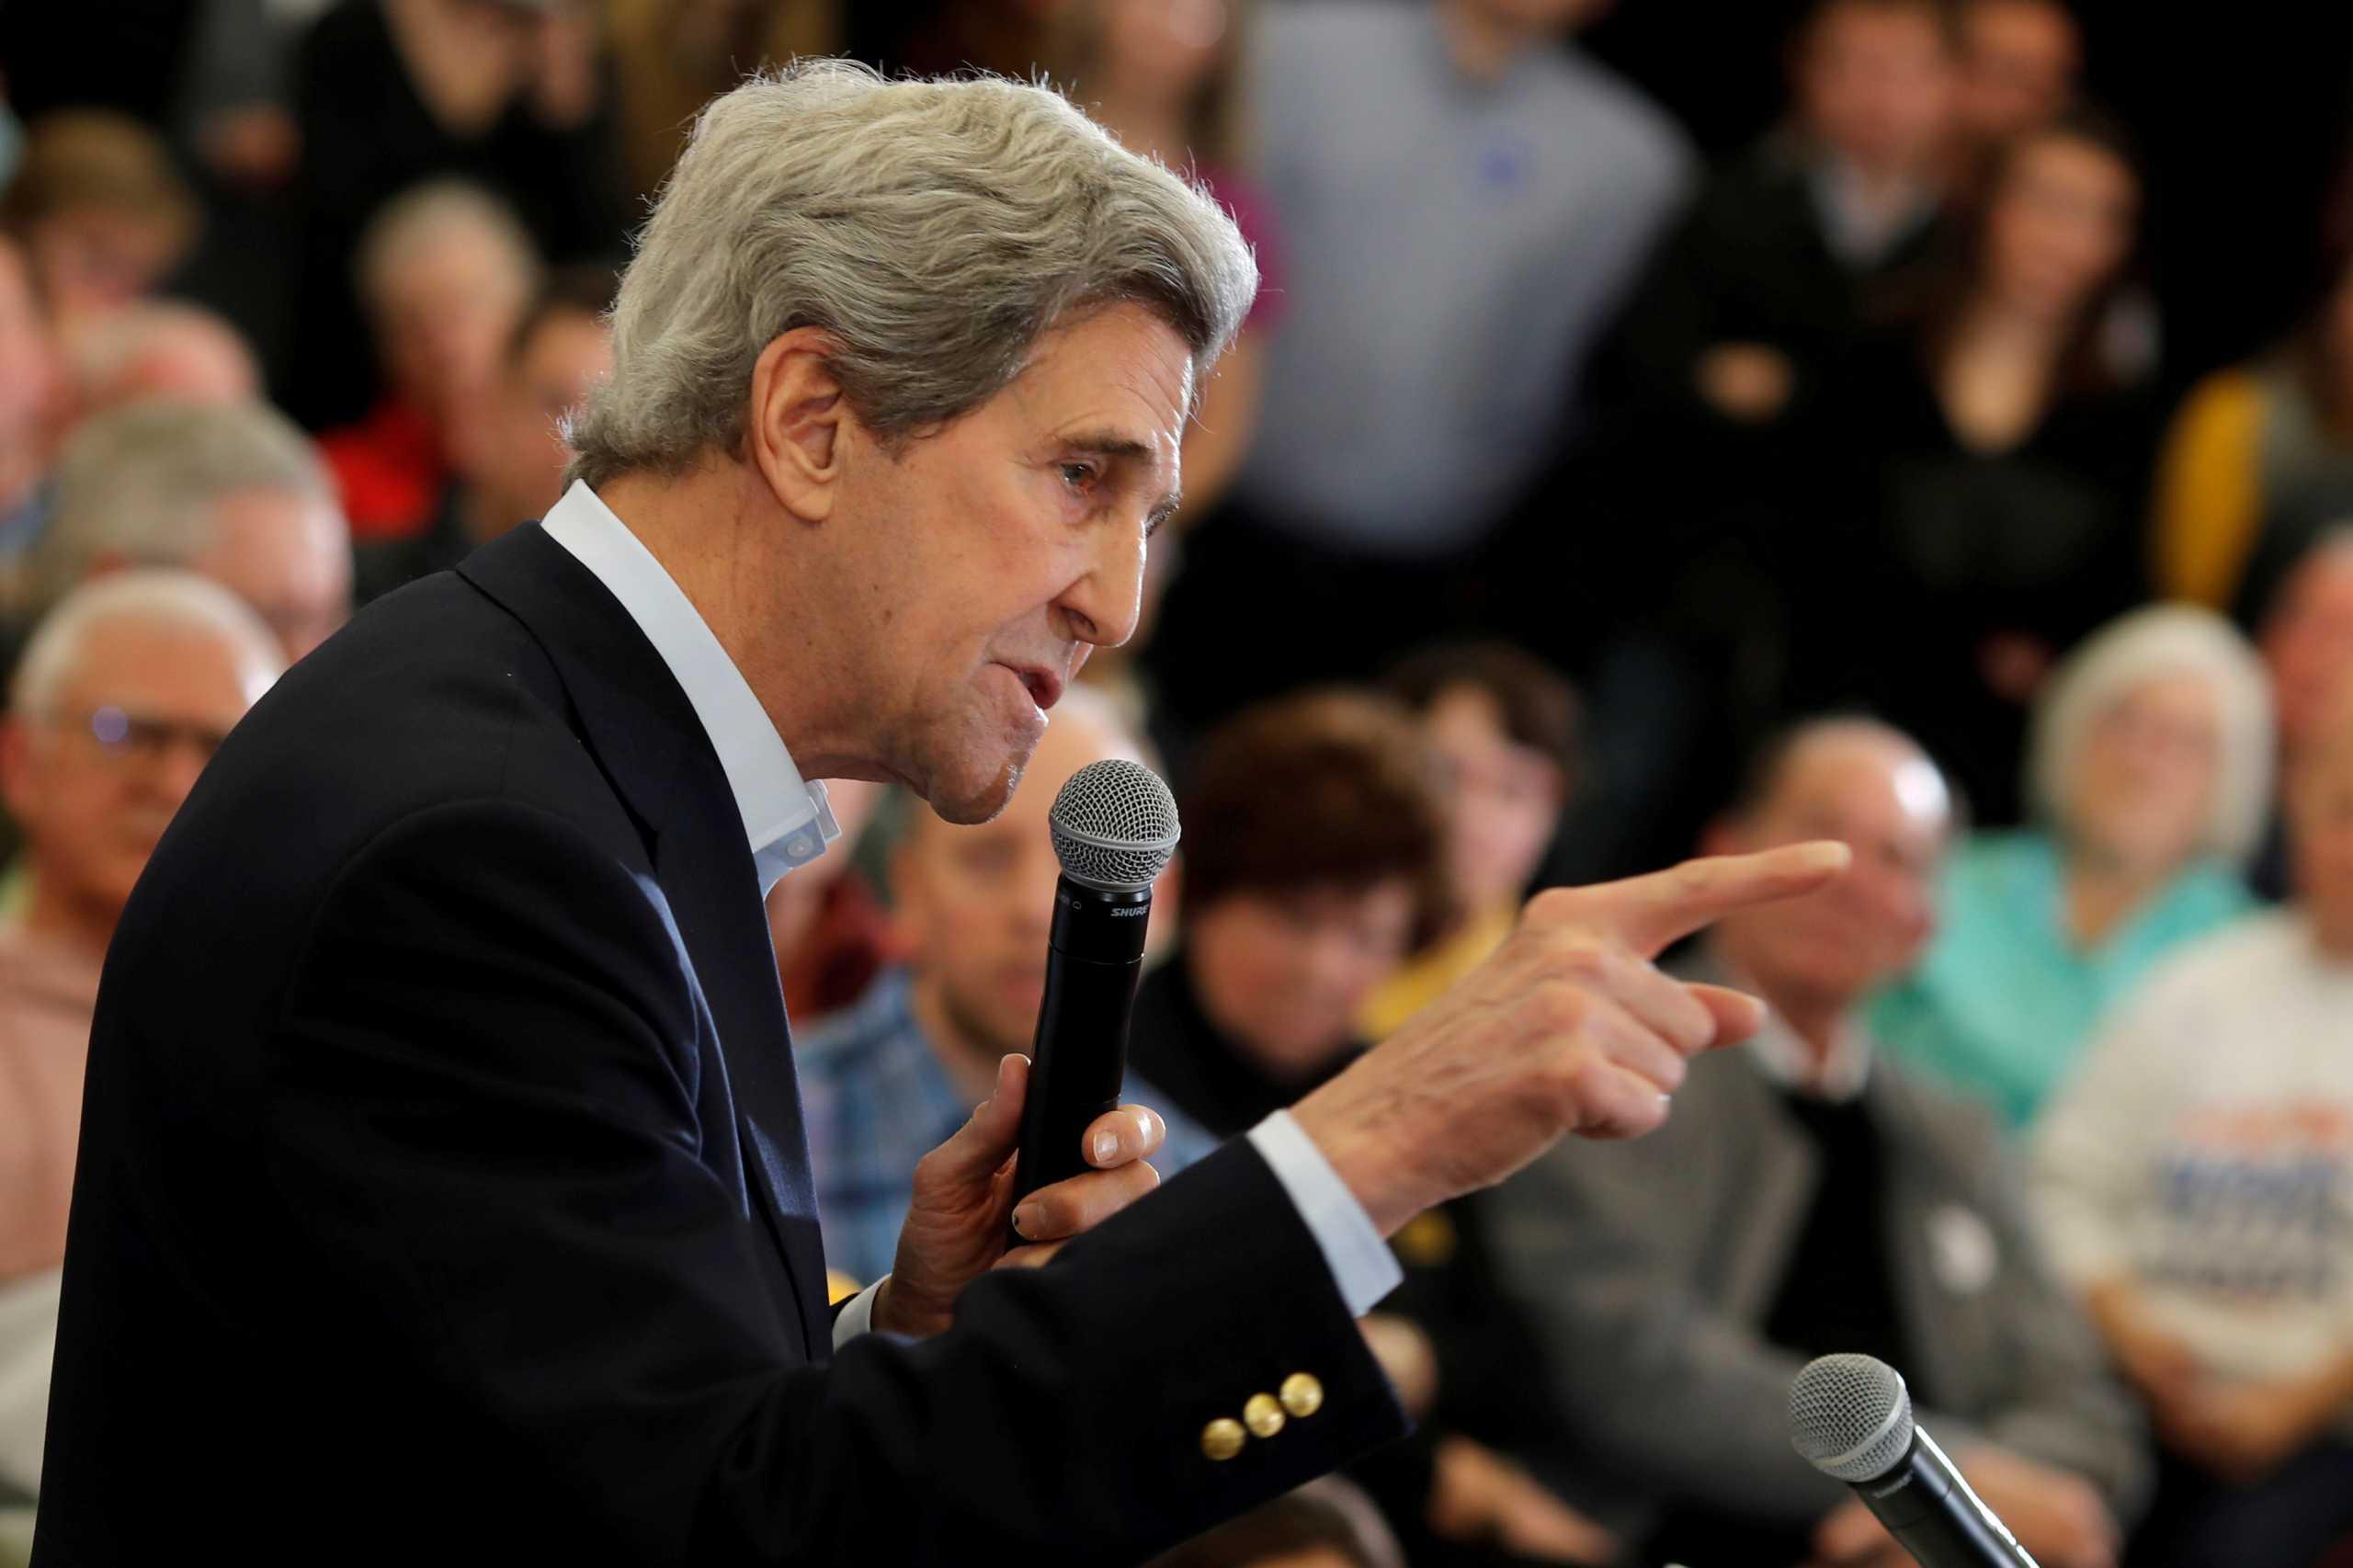 Yπέρ της διαπραγμάτευσης με την Ευρώπη για την κλιματική αλλαγή δηλώνει o απεσταλμένος των ΗΠΑ Τζον Κέρι